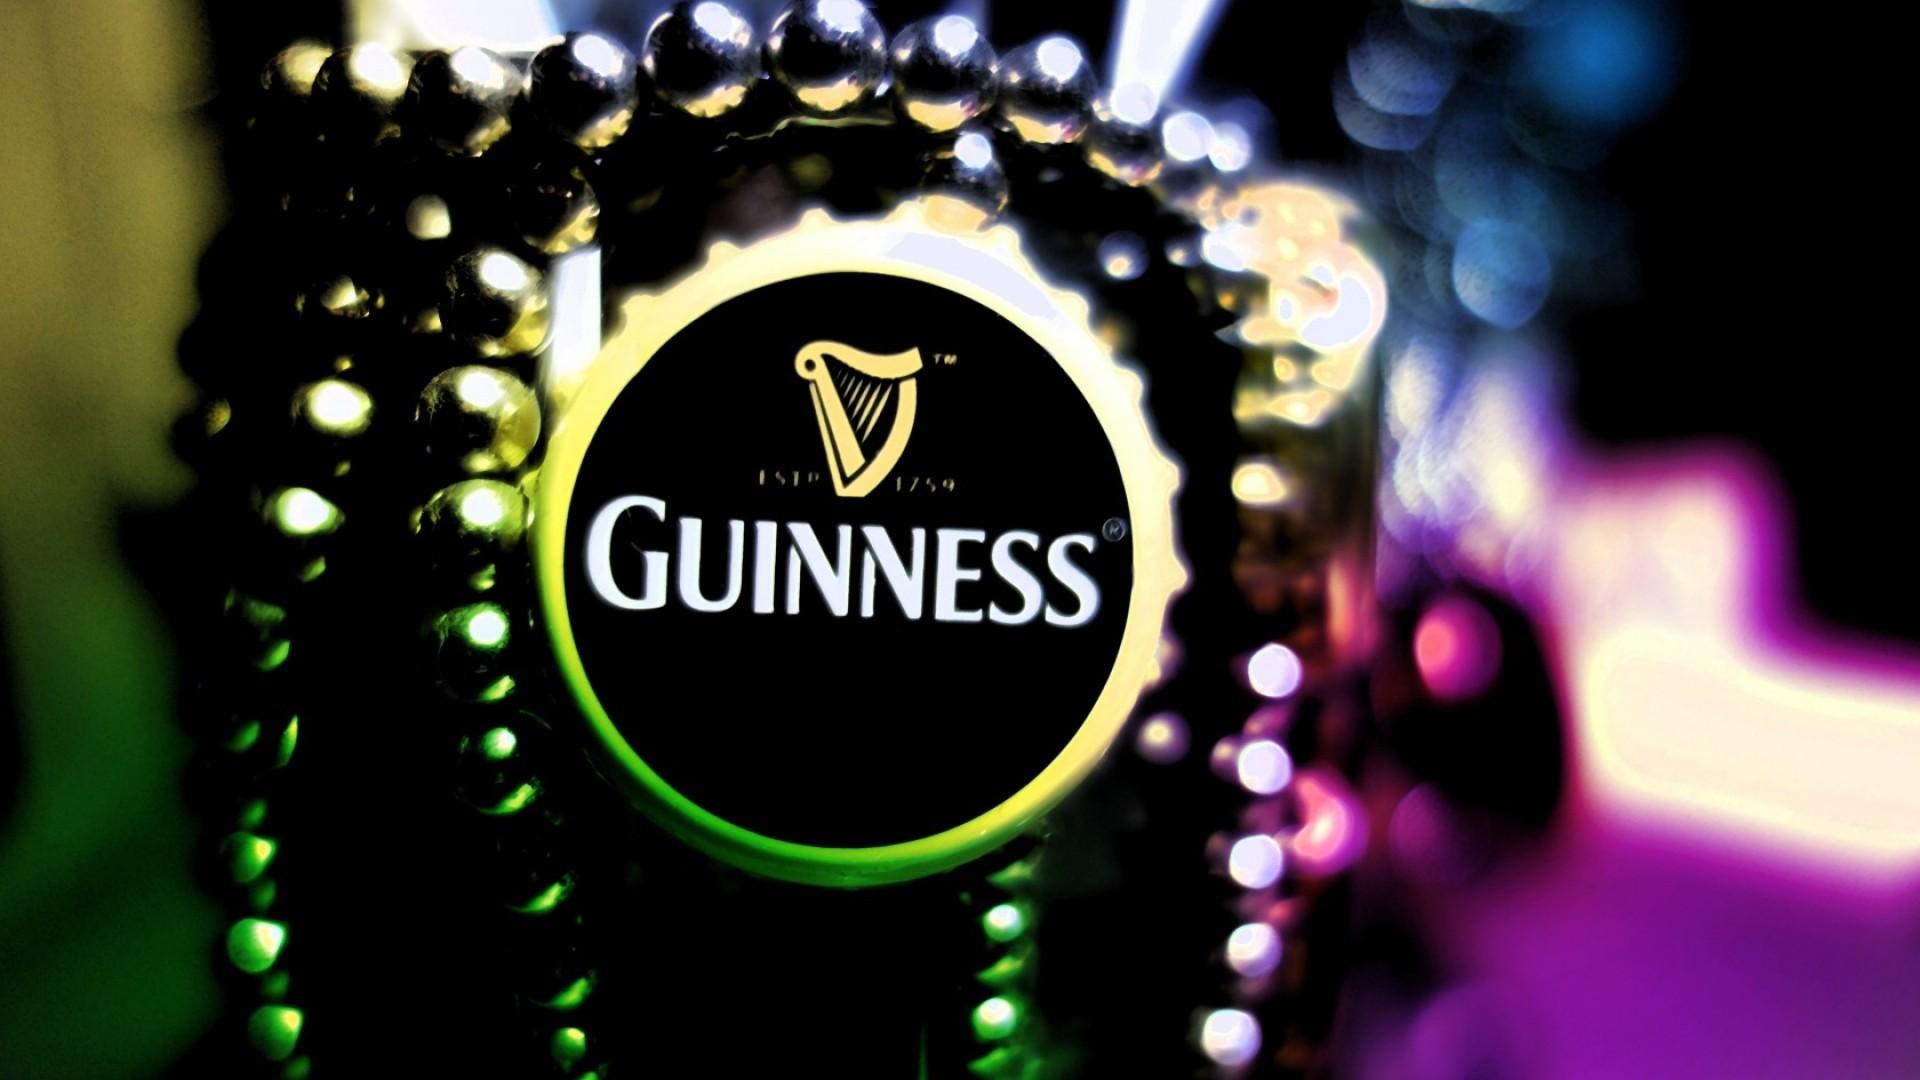 Res: 1920x1080, guinness, beer, light